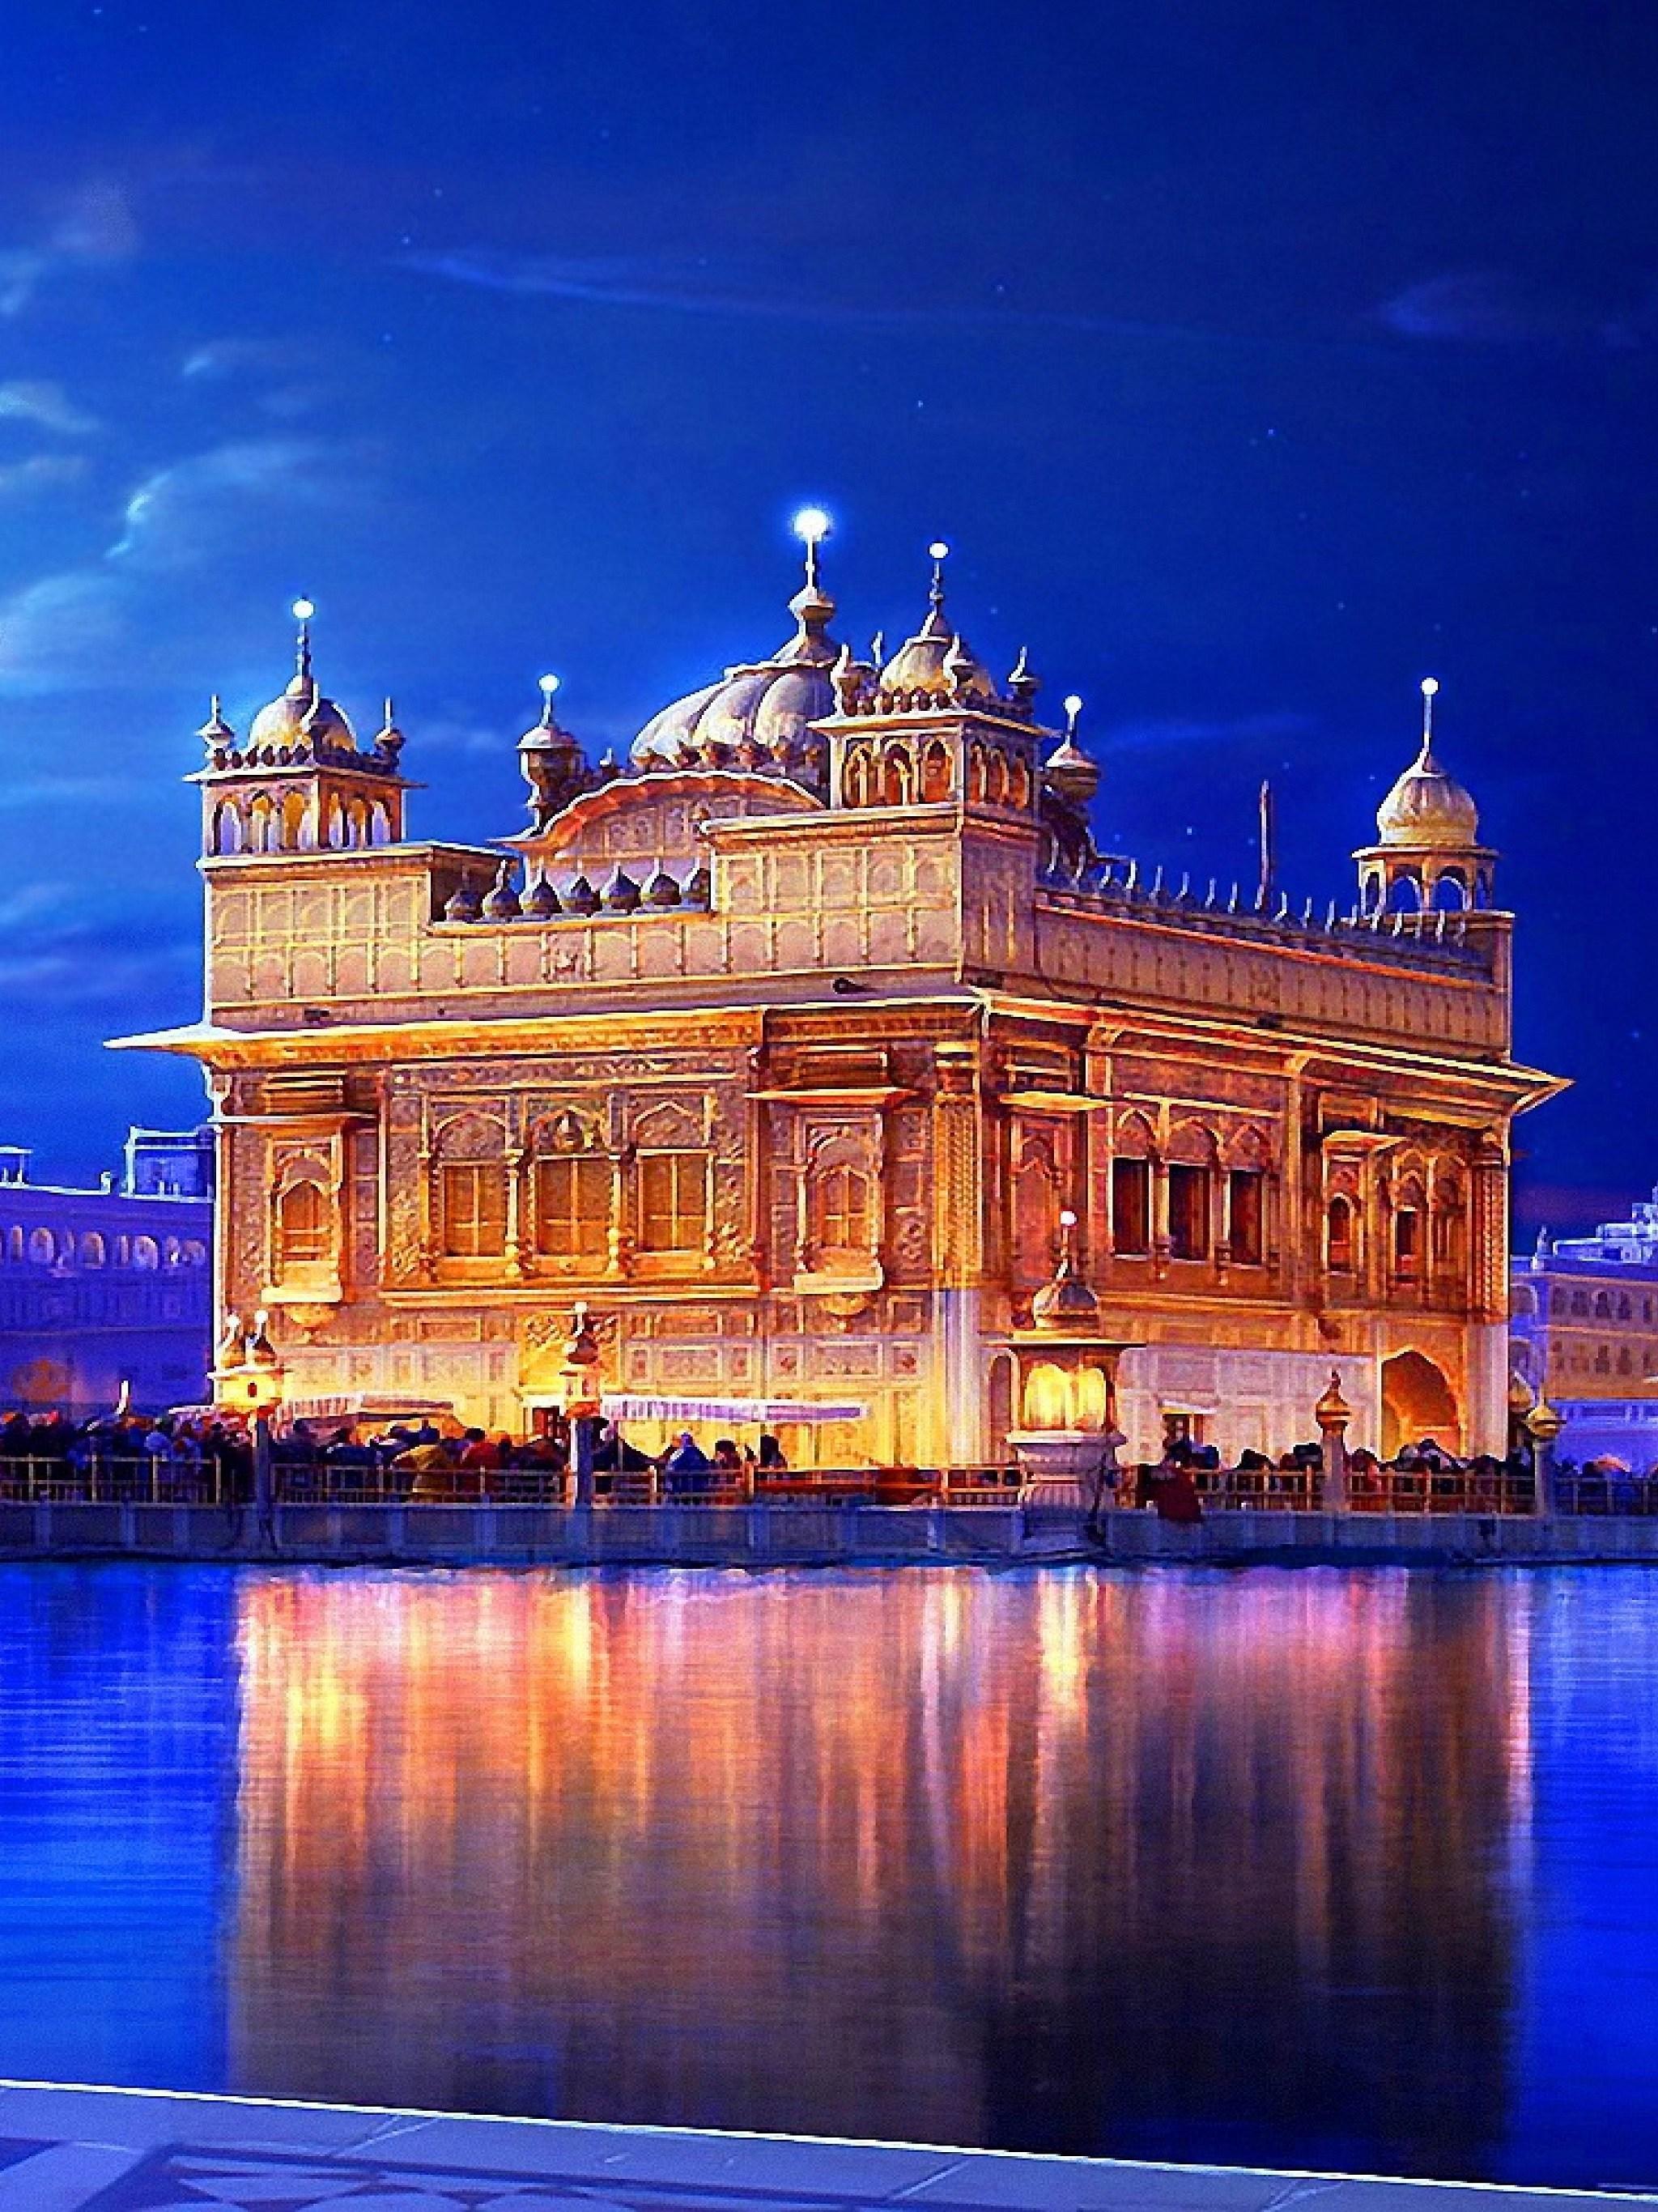 Golden Temple Night Wallpapers Top Free Golden Temple Night Backgrounds Wallpaperaccess 1080p ultra hd golden temple hd